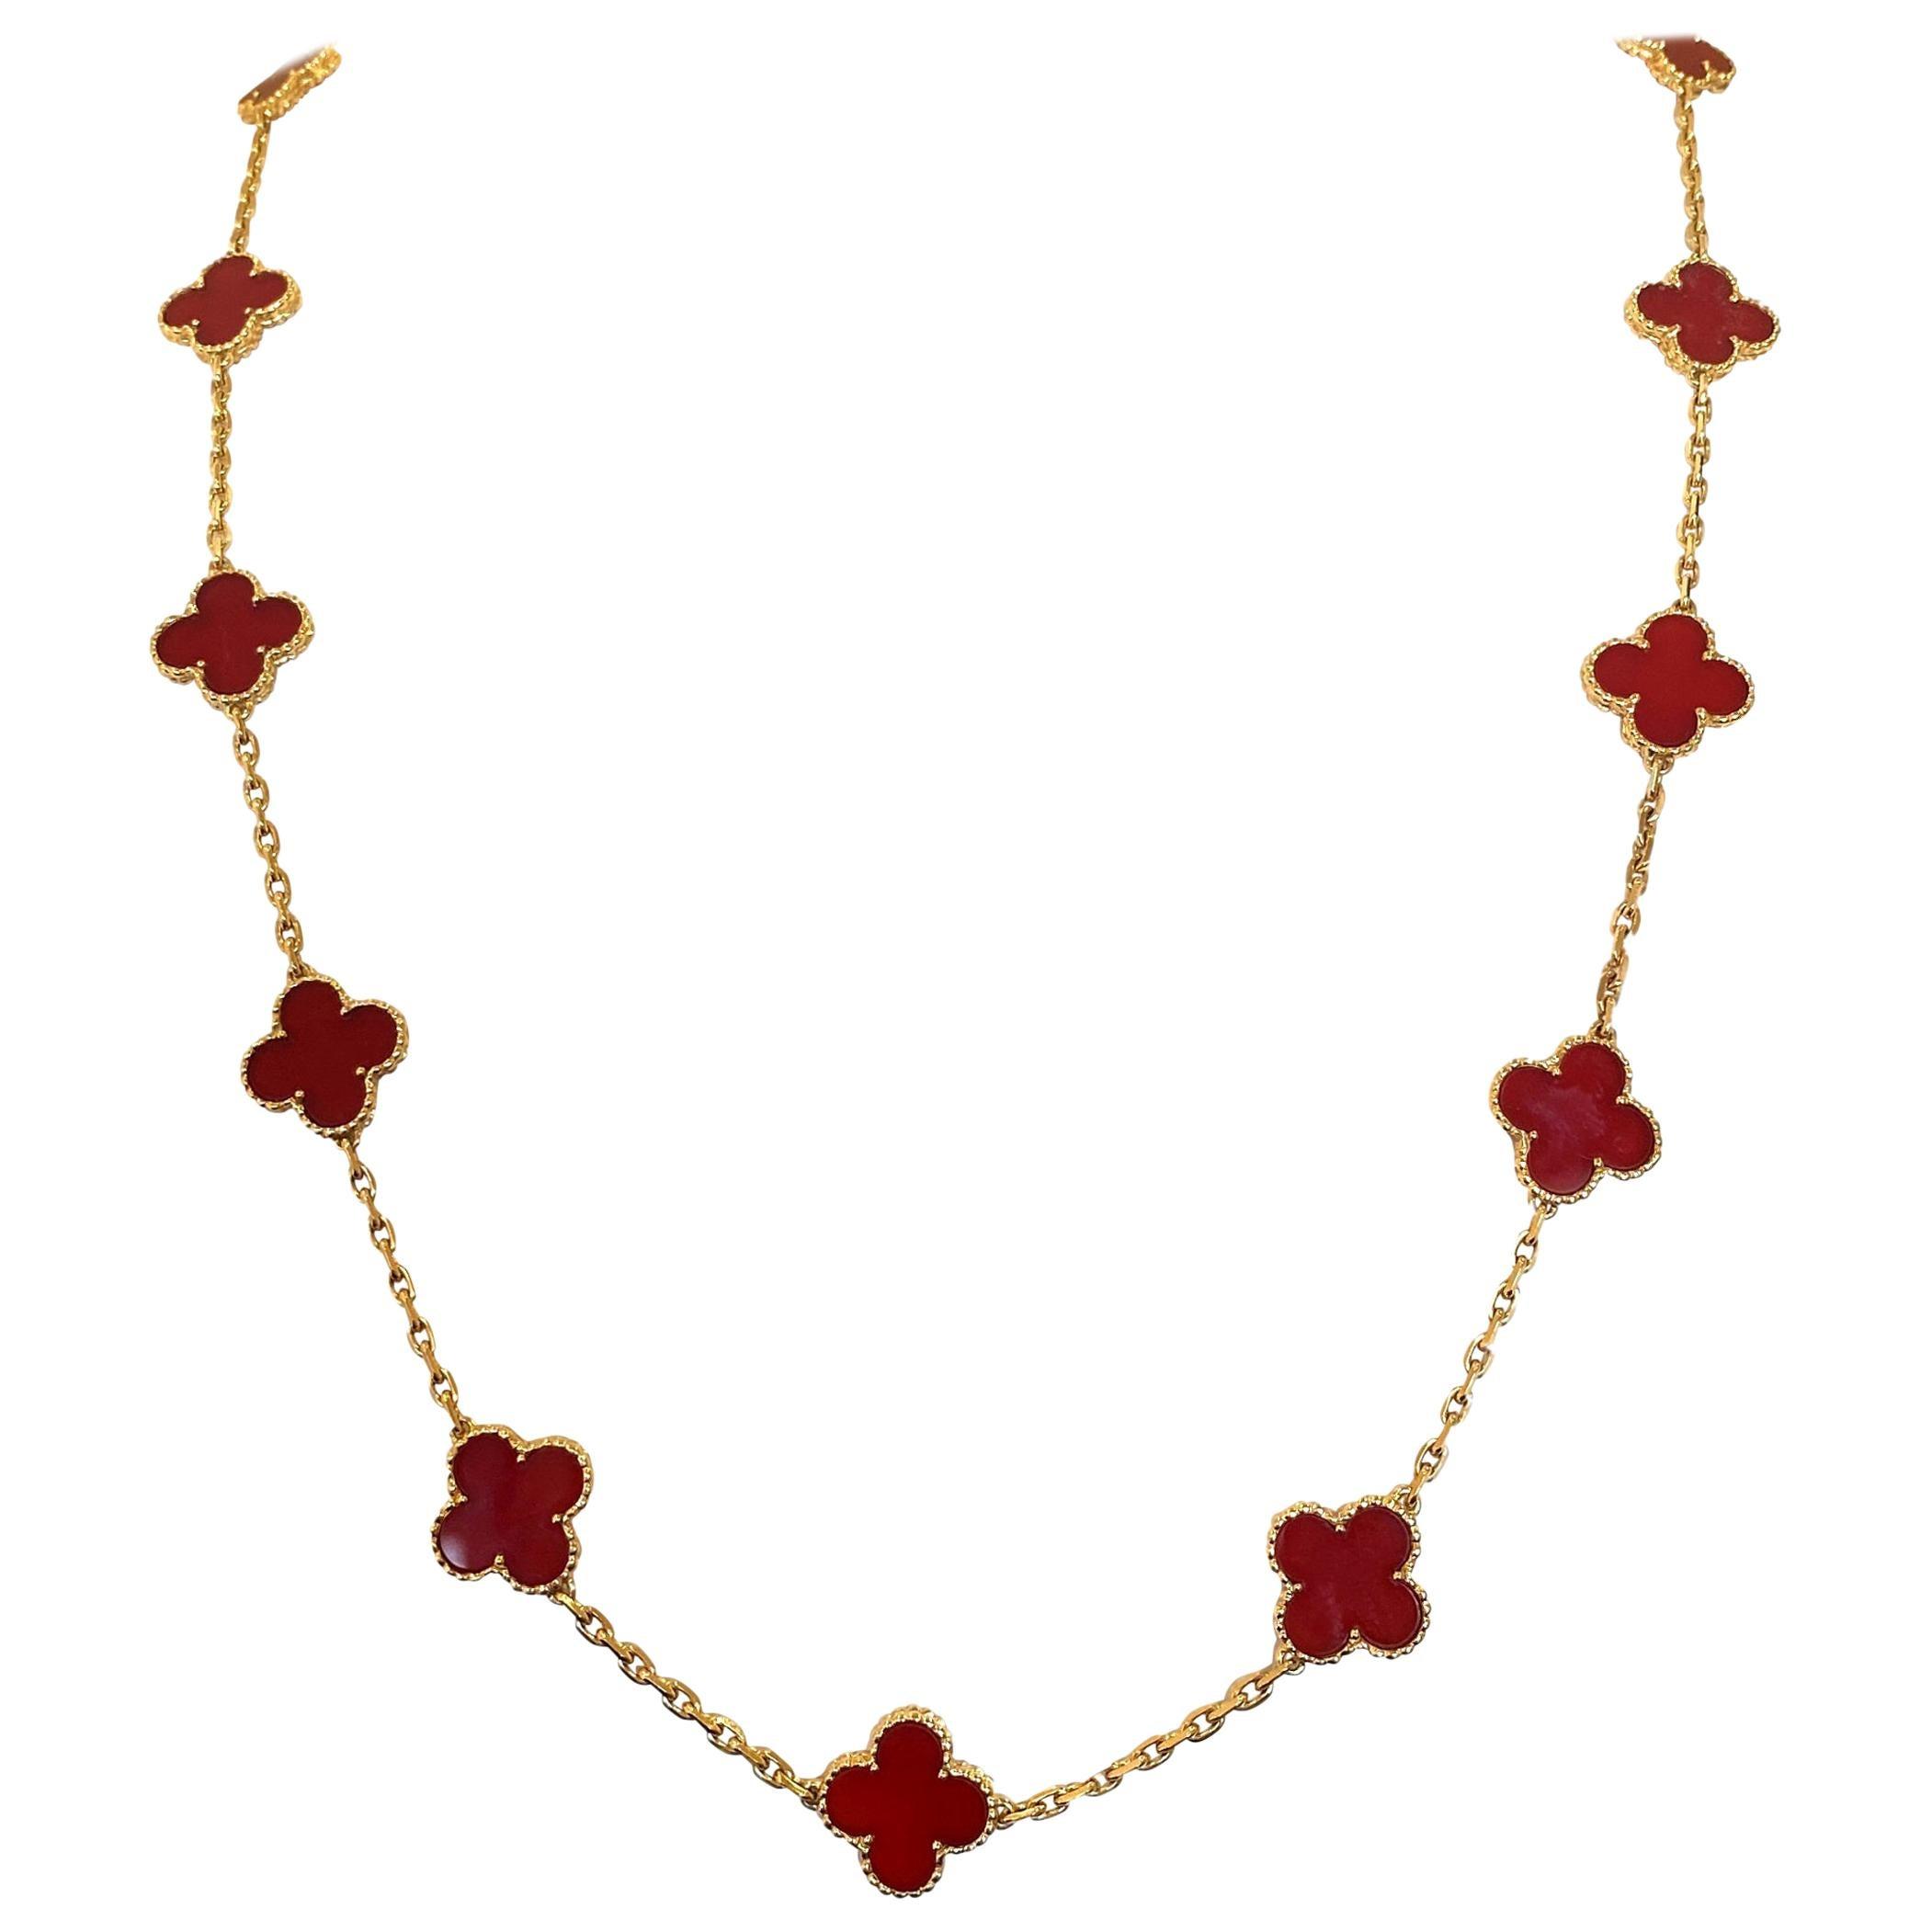 Van Cleef & Arpels Vintage Alhambra Carnelian Necklace 18KY